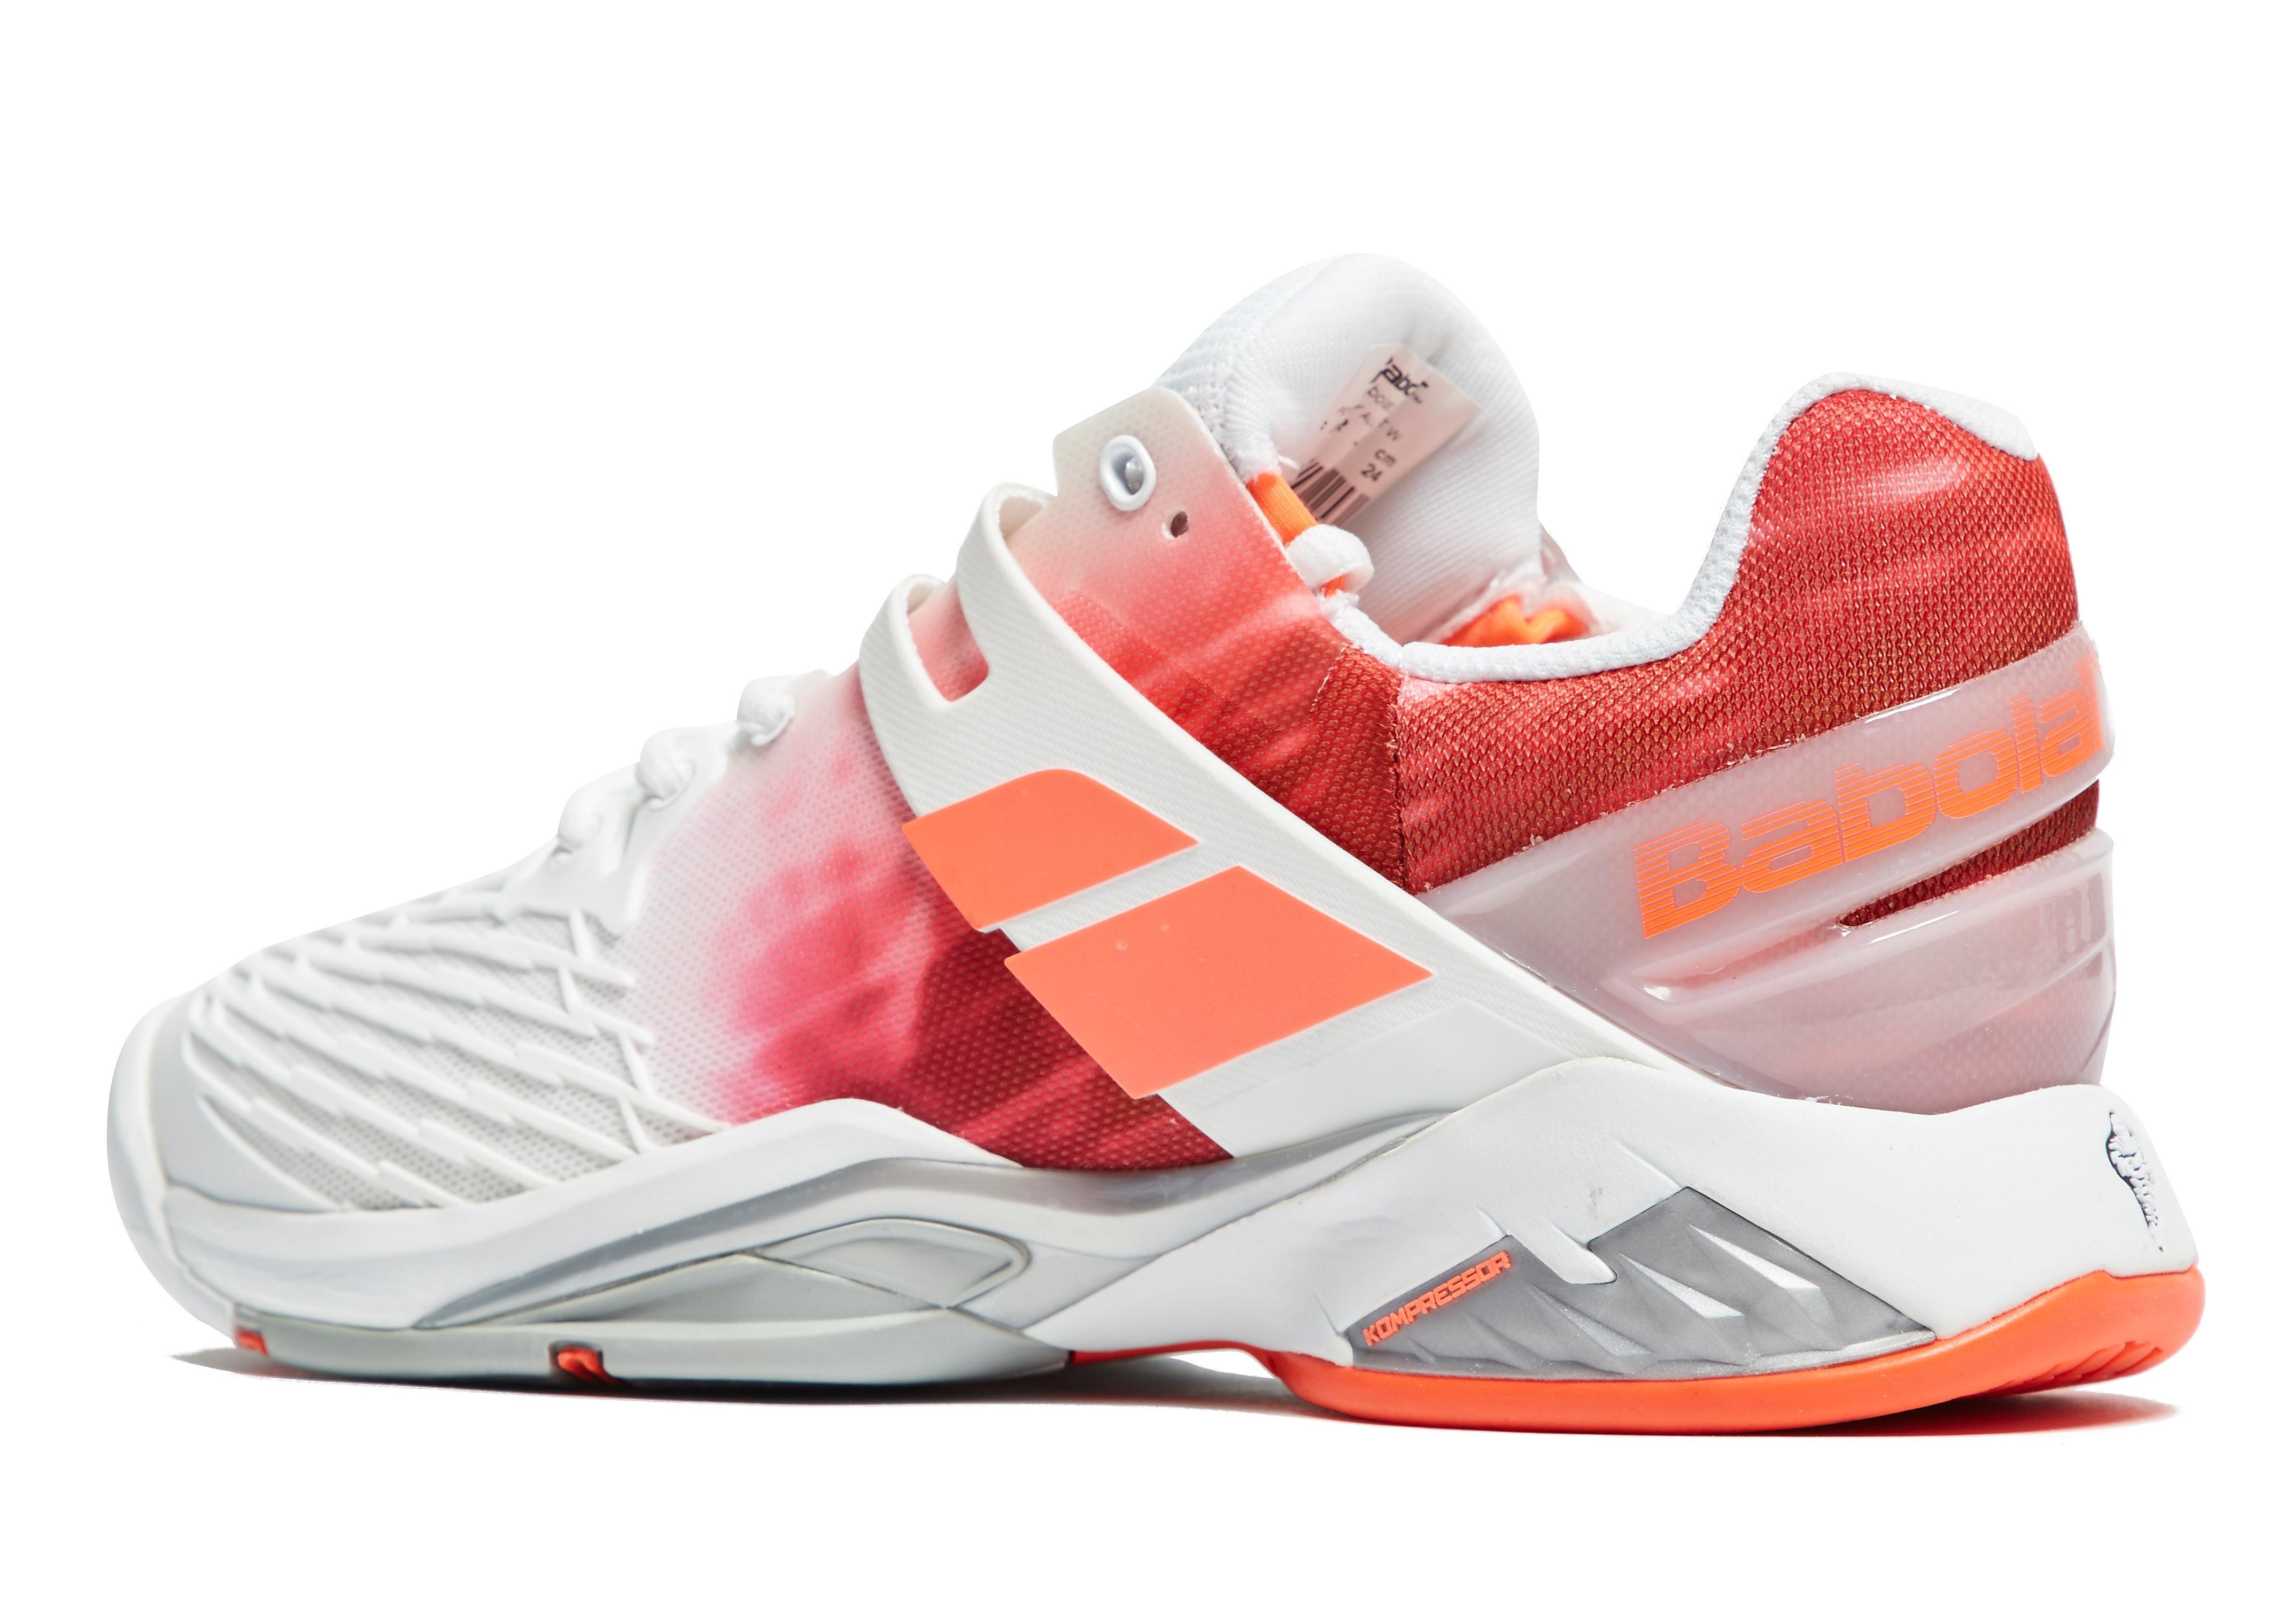 Babolat Propulse Fury Tennis Shoe Women's